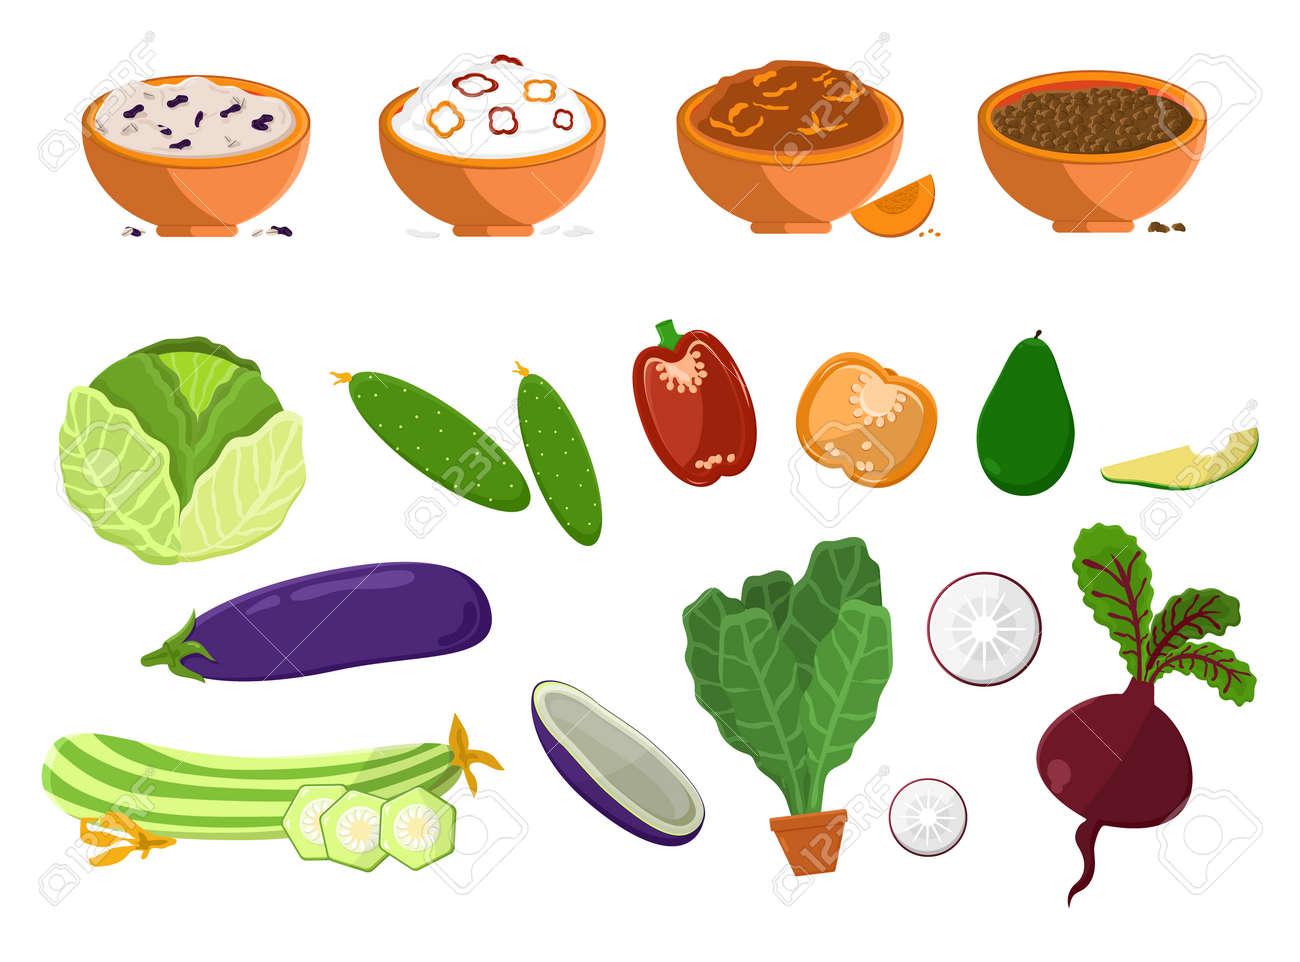 Of thali set, Indian cuisine Dal Vegetarian cuisine Roti, non-veg food  transparent background PNG clipart | HiClipart